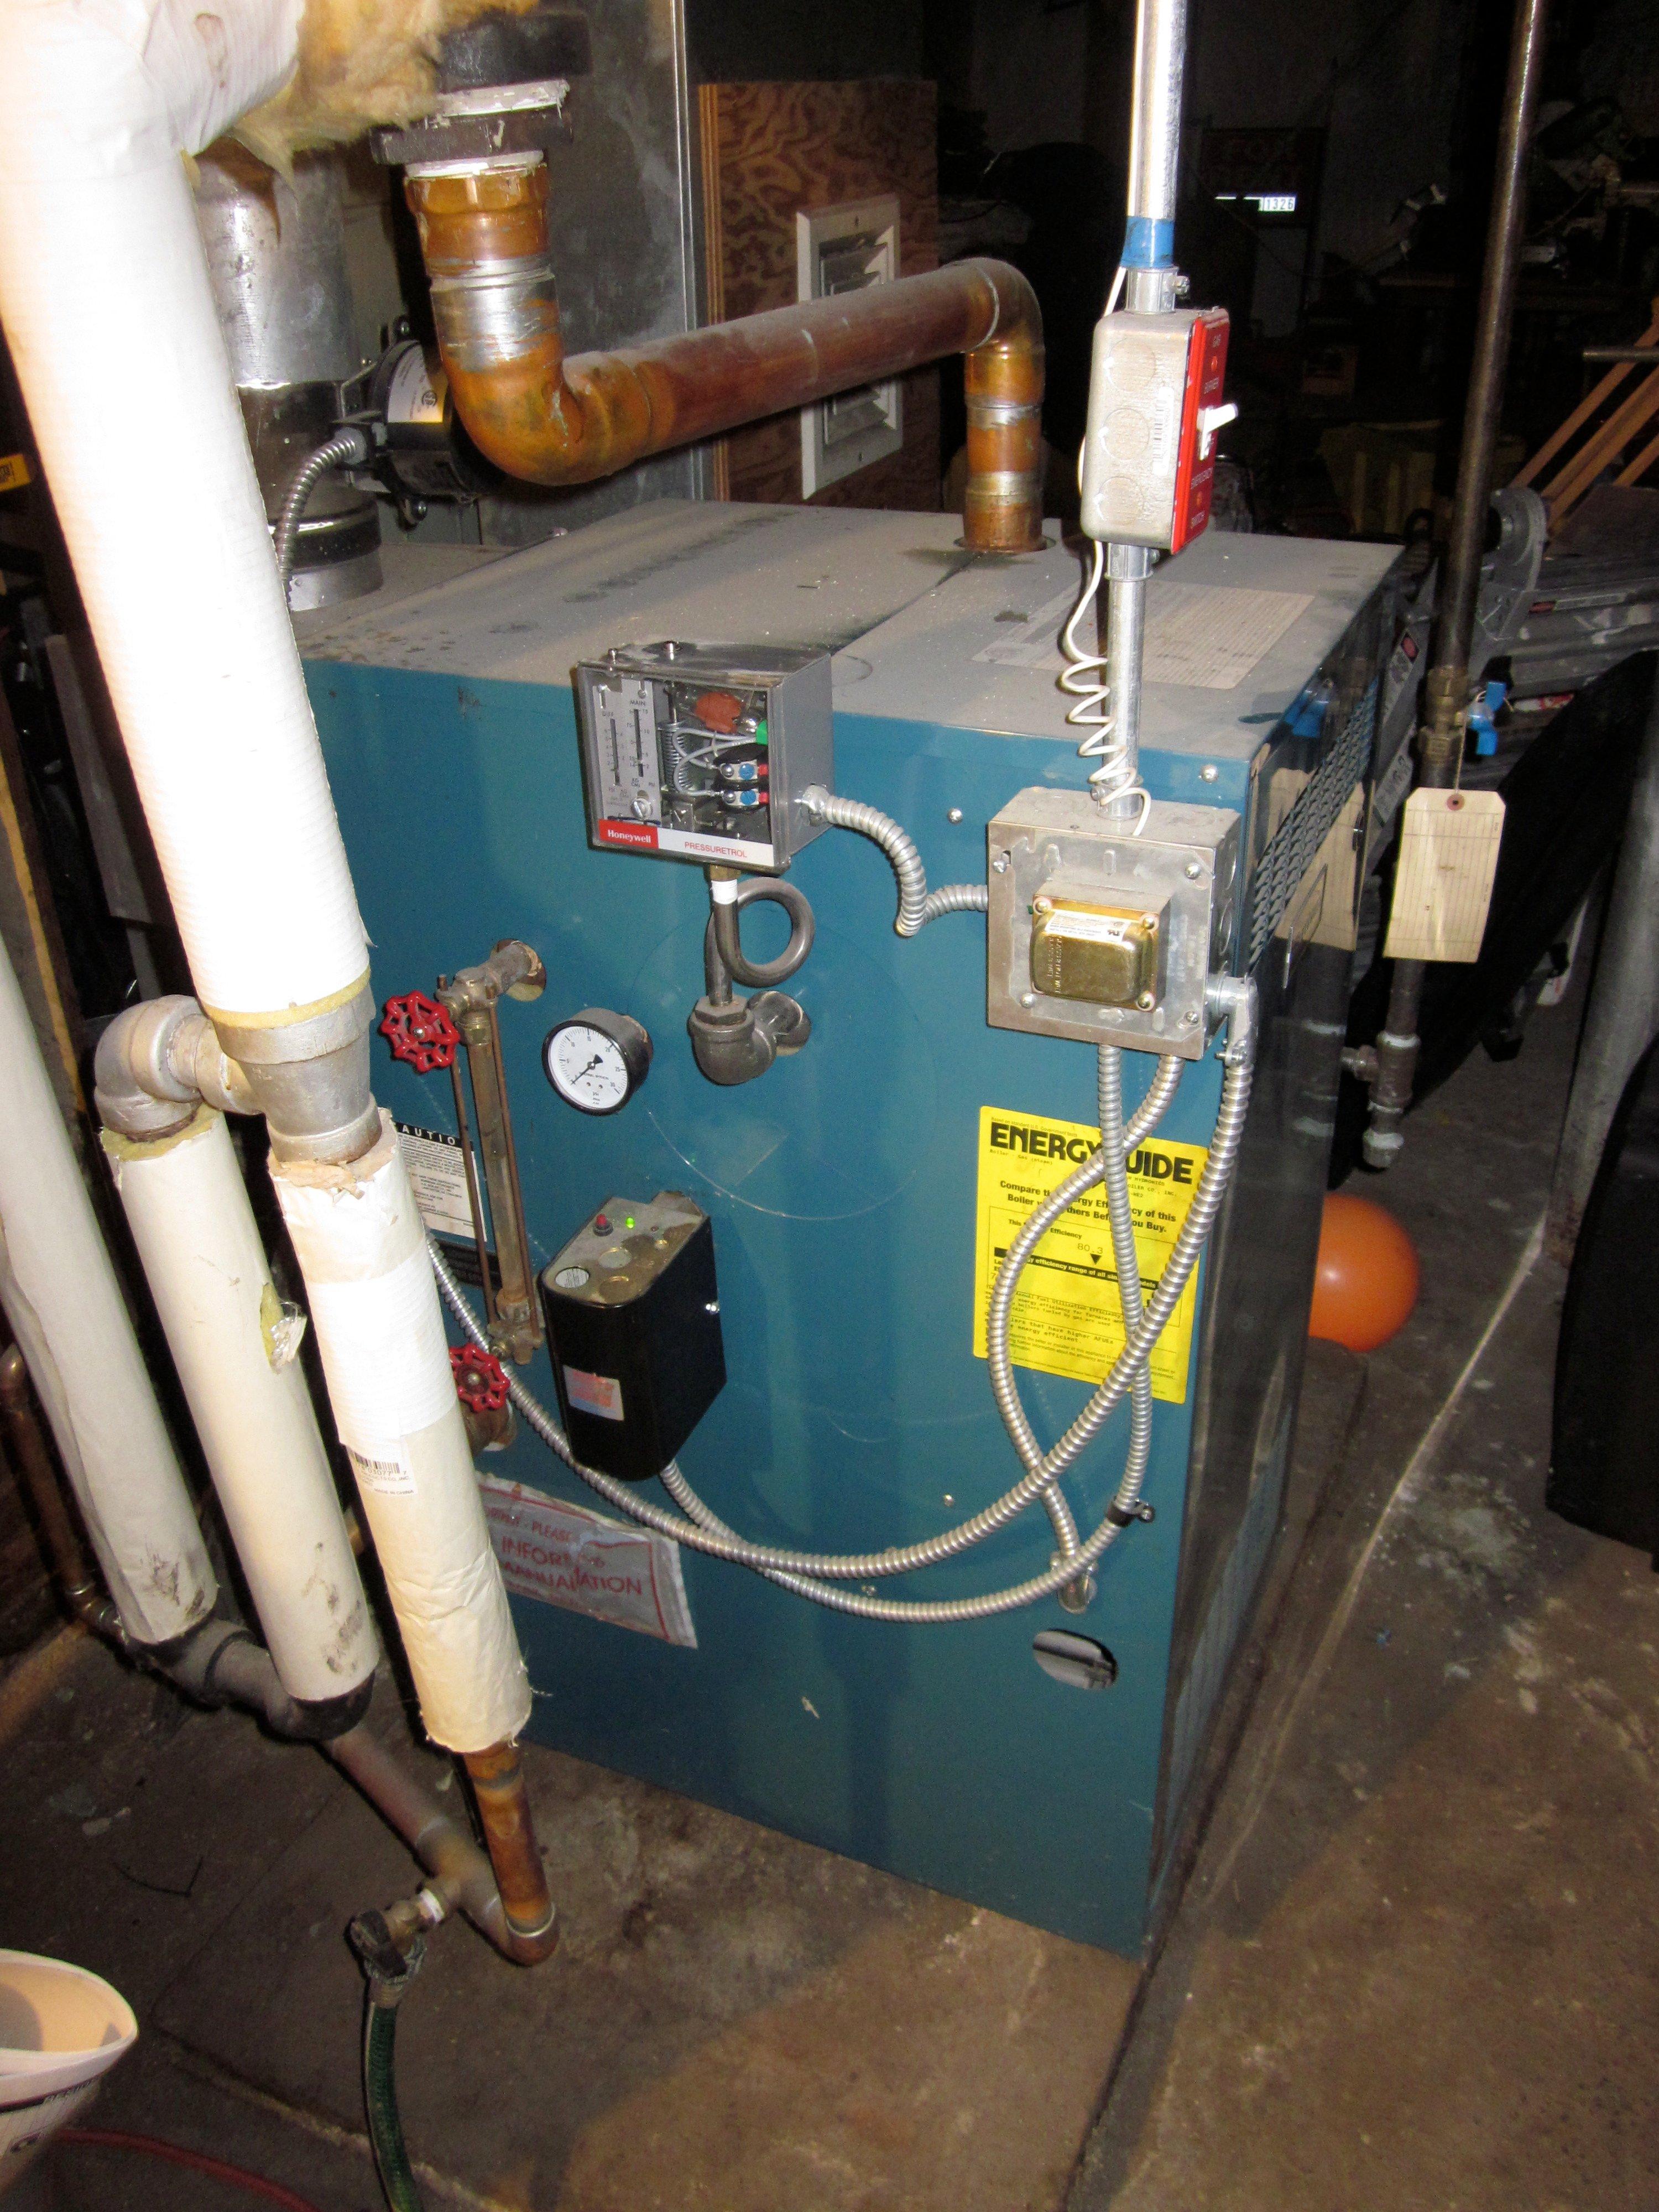 IMG_4280 pressuretrol setting on burnham heating help the wall honeywell pressuretrol wiring diagram at nearapp.co